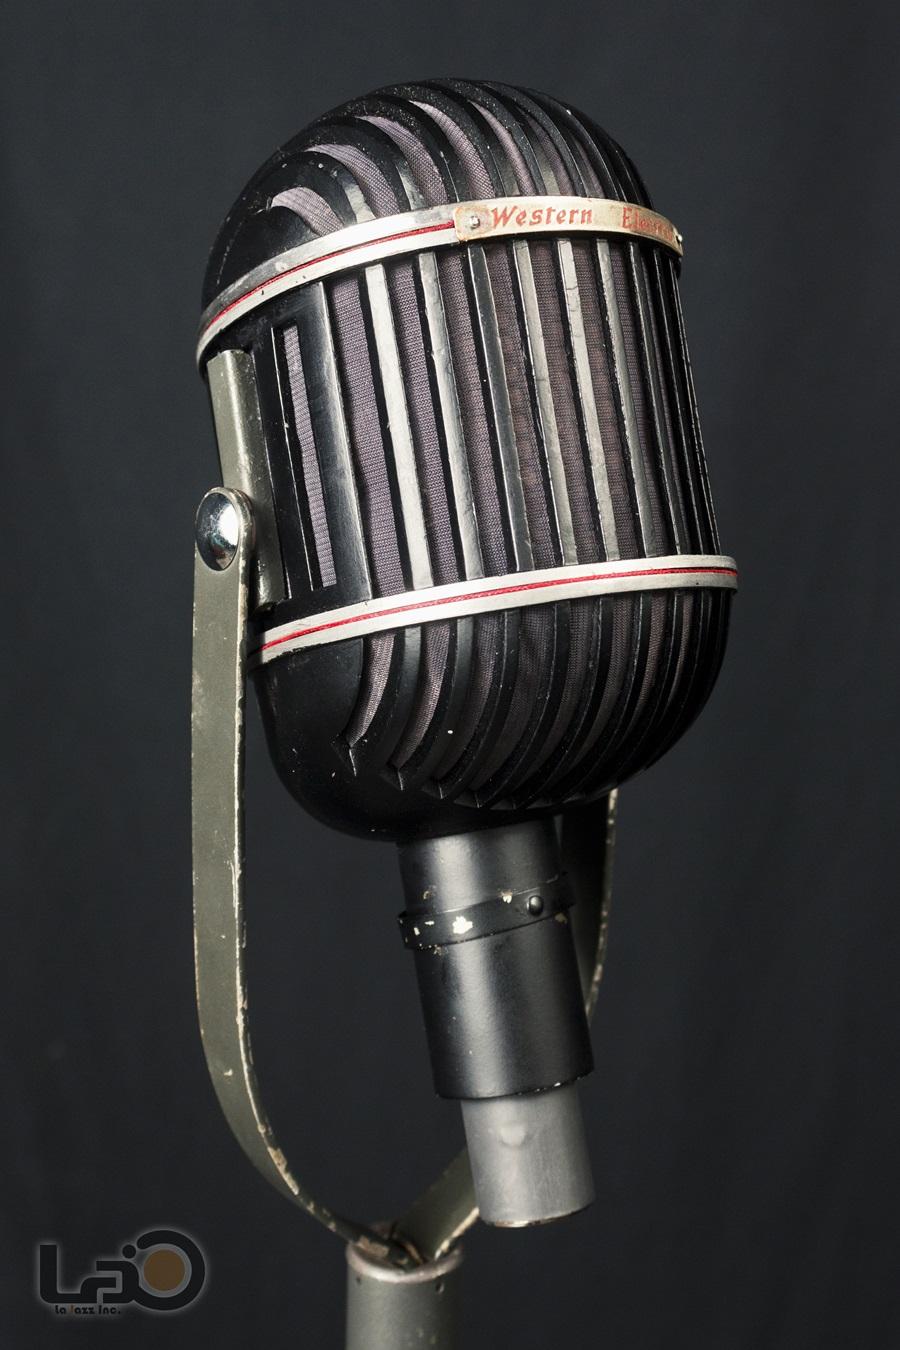 Western Electric 639A ◇ ウェスタン・エレクトリック 639A 「鉄仮面」 リボンマイク ◇4